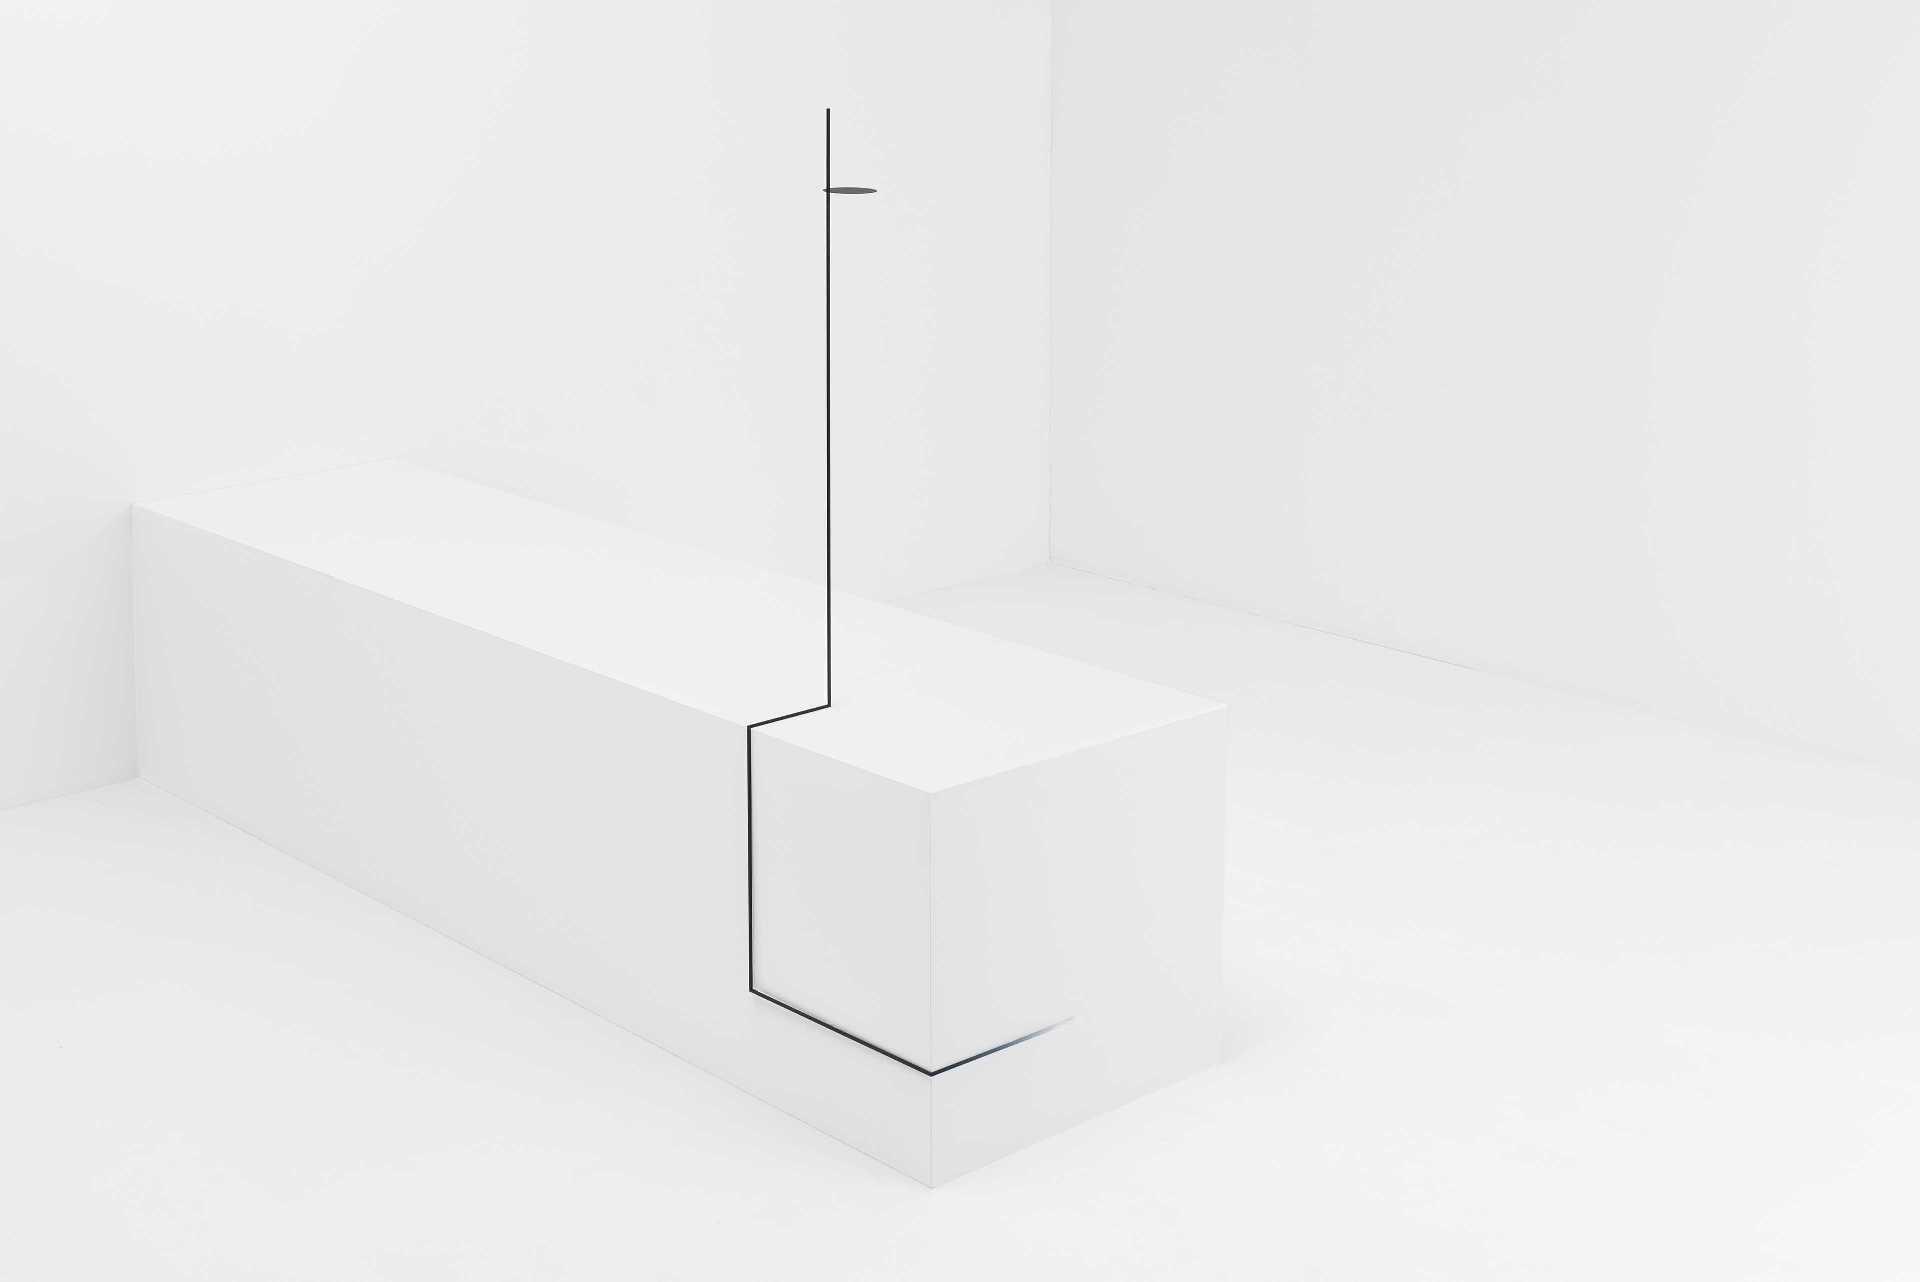 Nendo: Border Table  - border table23 hiroshi iwasaki 40